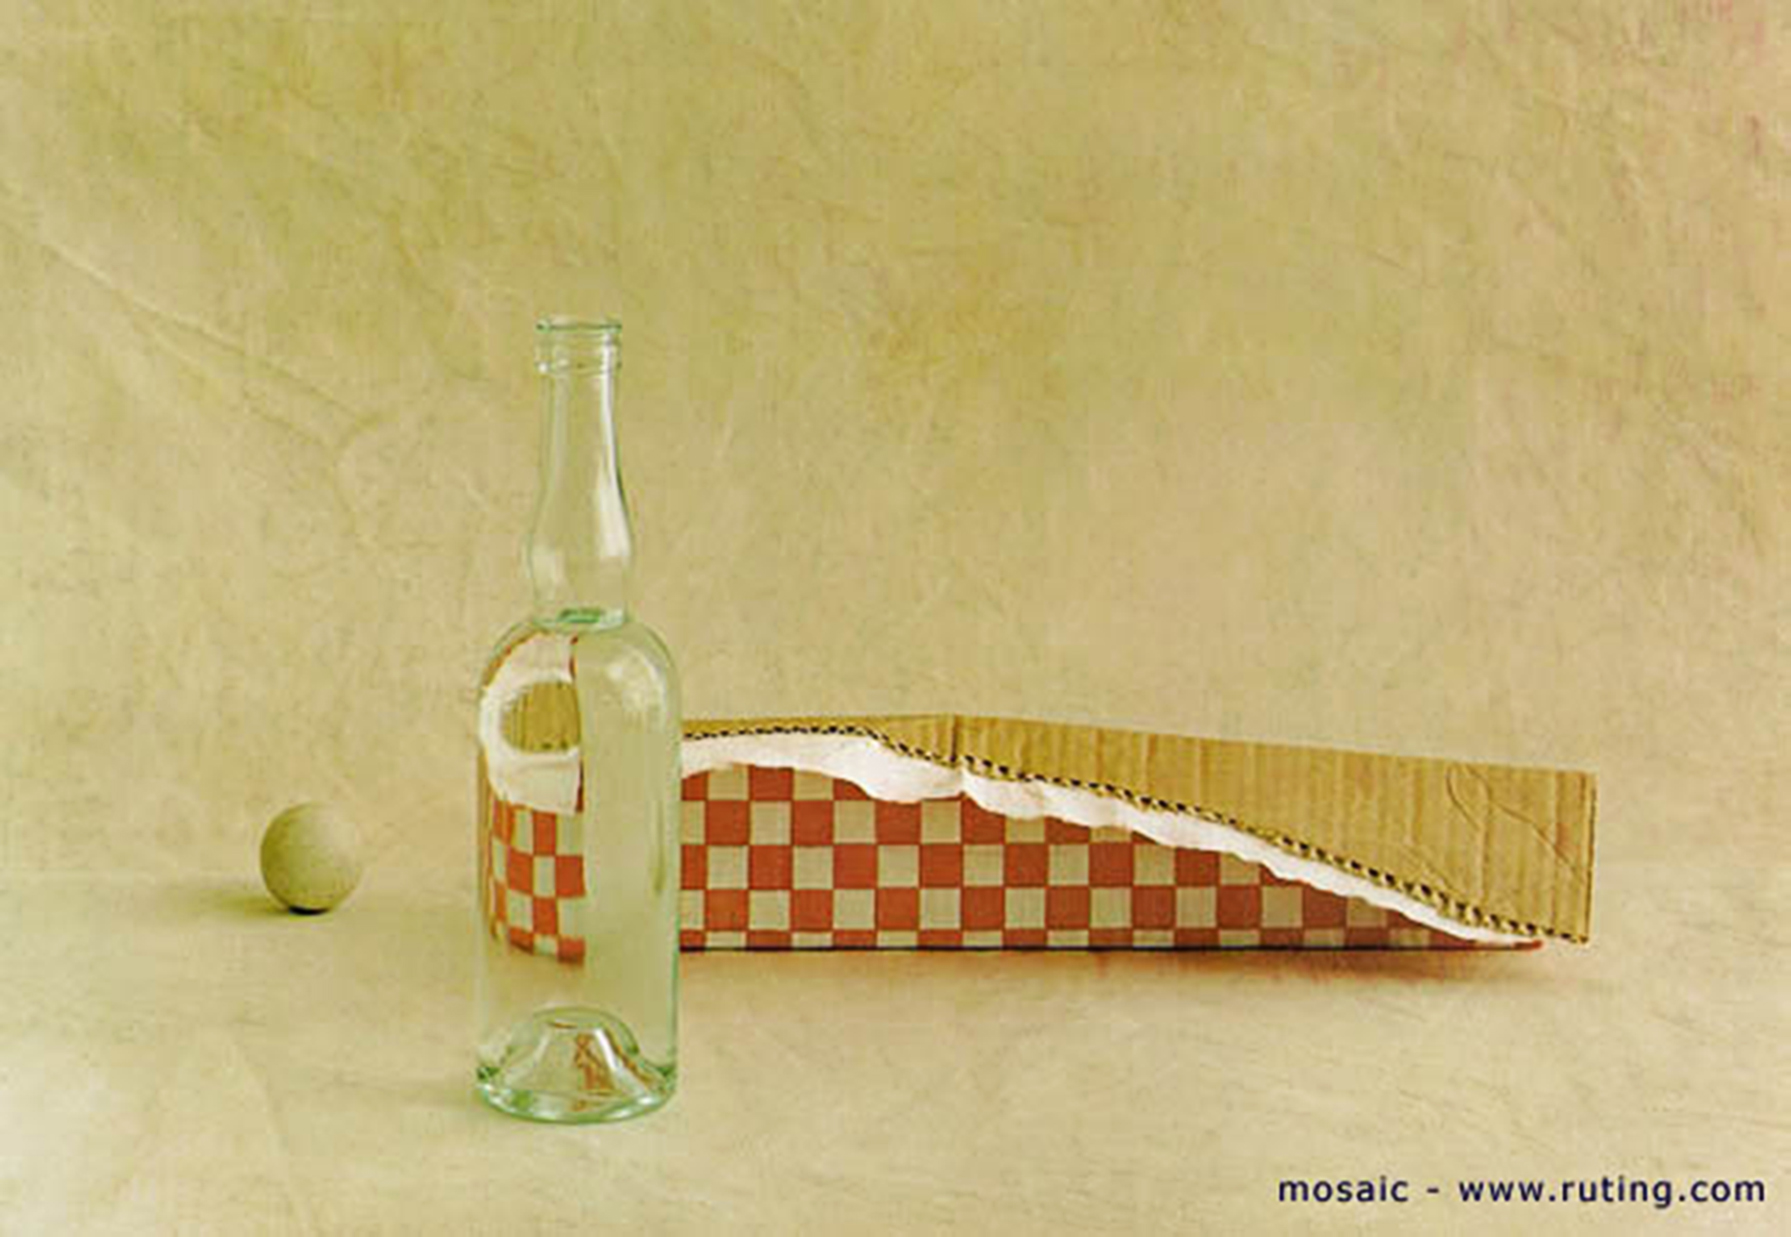 31 mosaic Peter Ruting